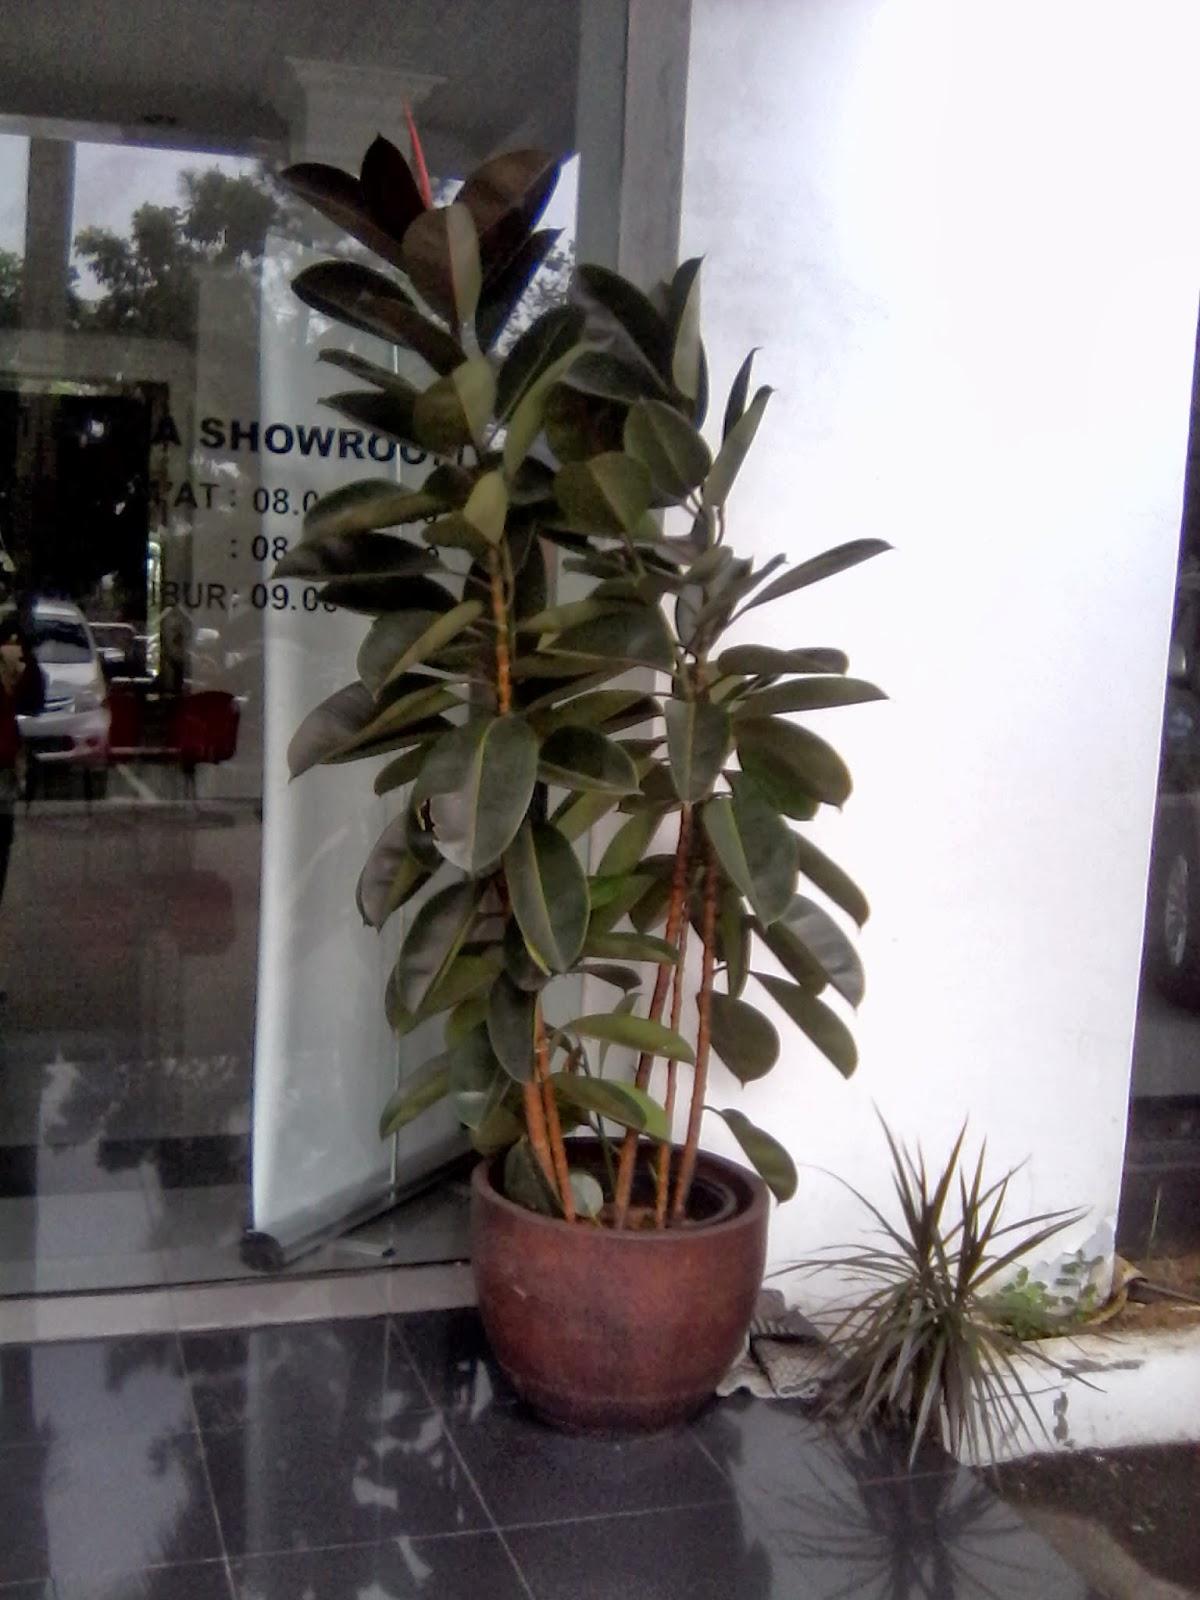 tanaman indoor berdaun lebar